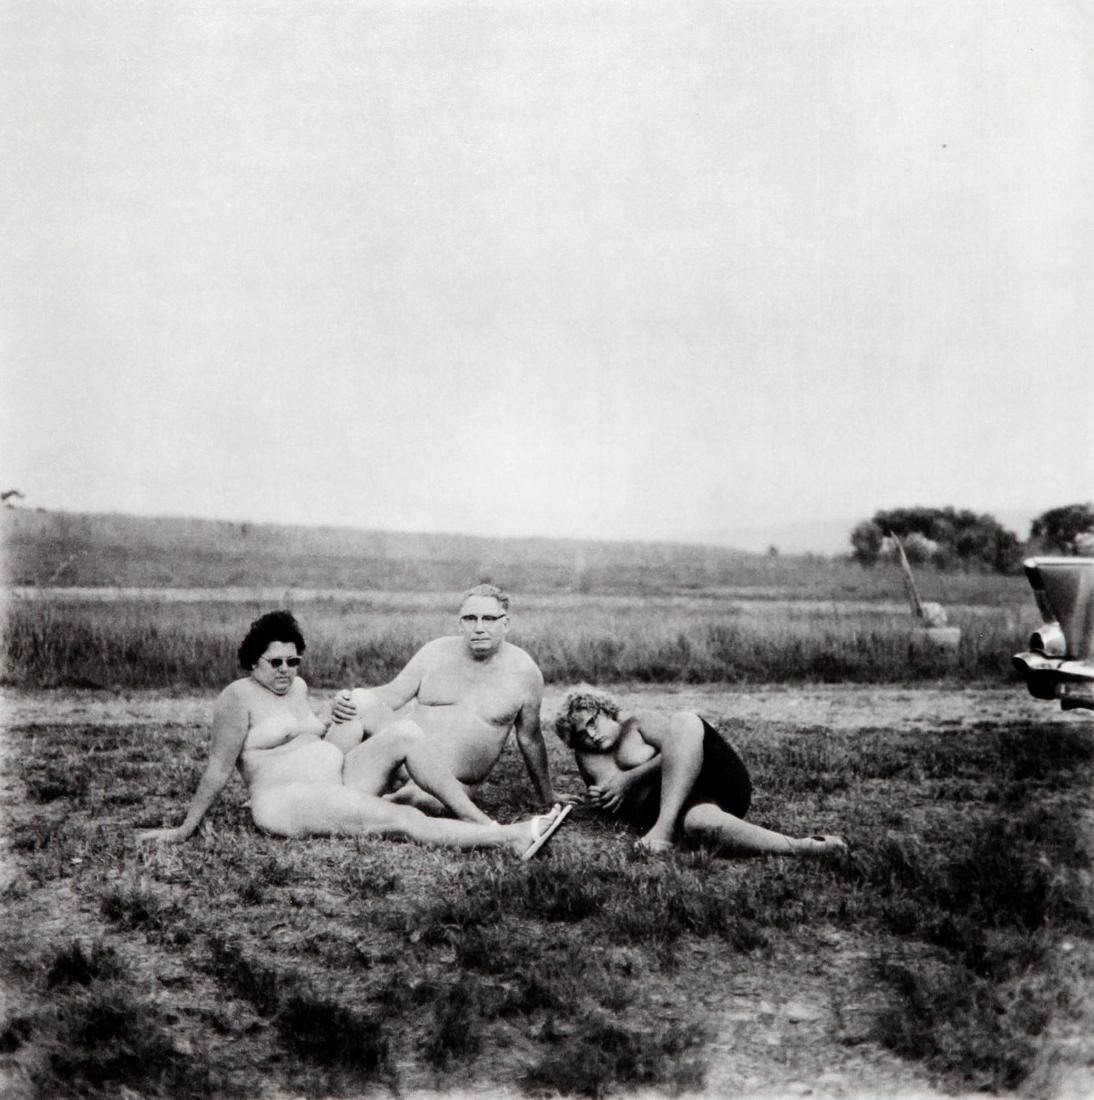 DIANE ARBUS - A family one evening nudist camp 1965